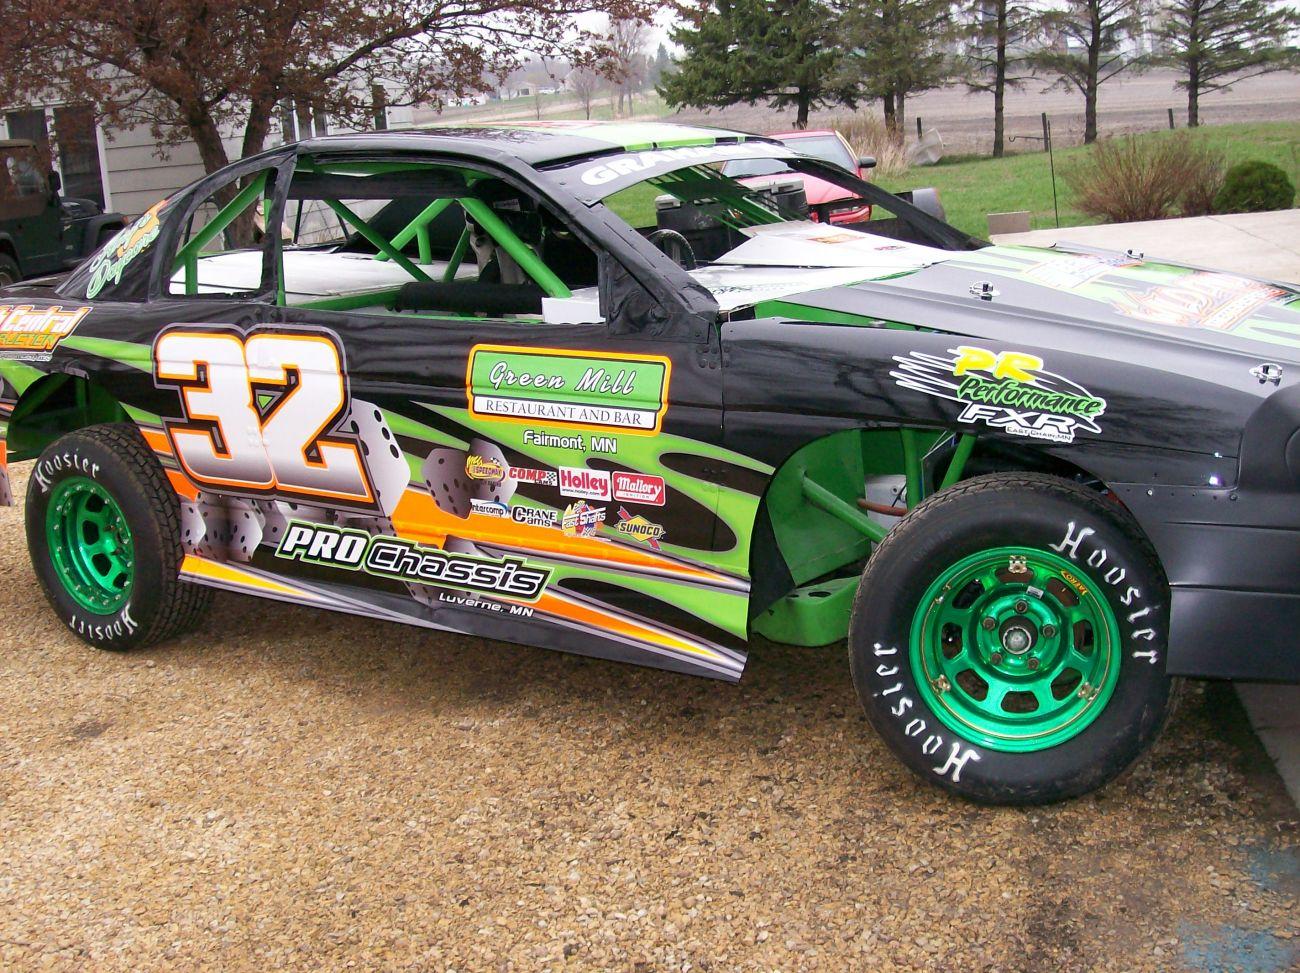 Racecar Graphics - Snap Graphics